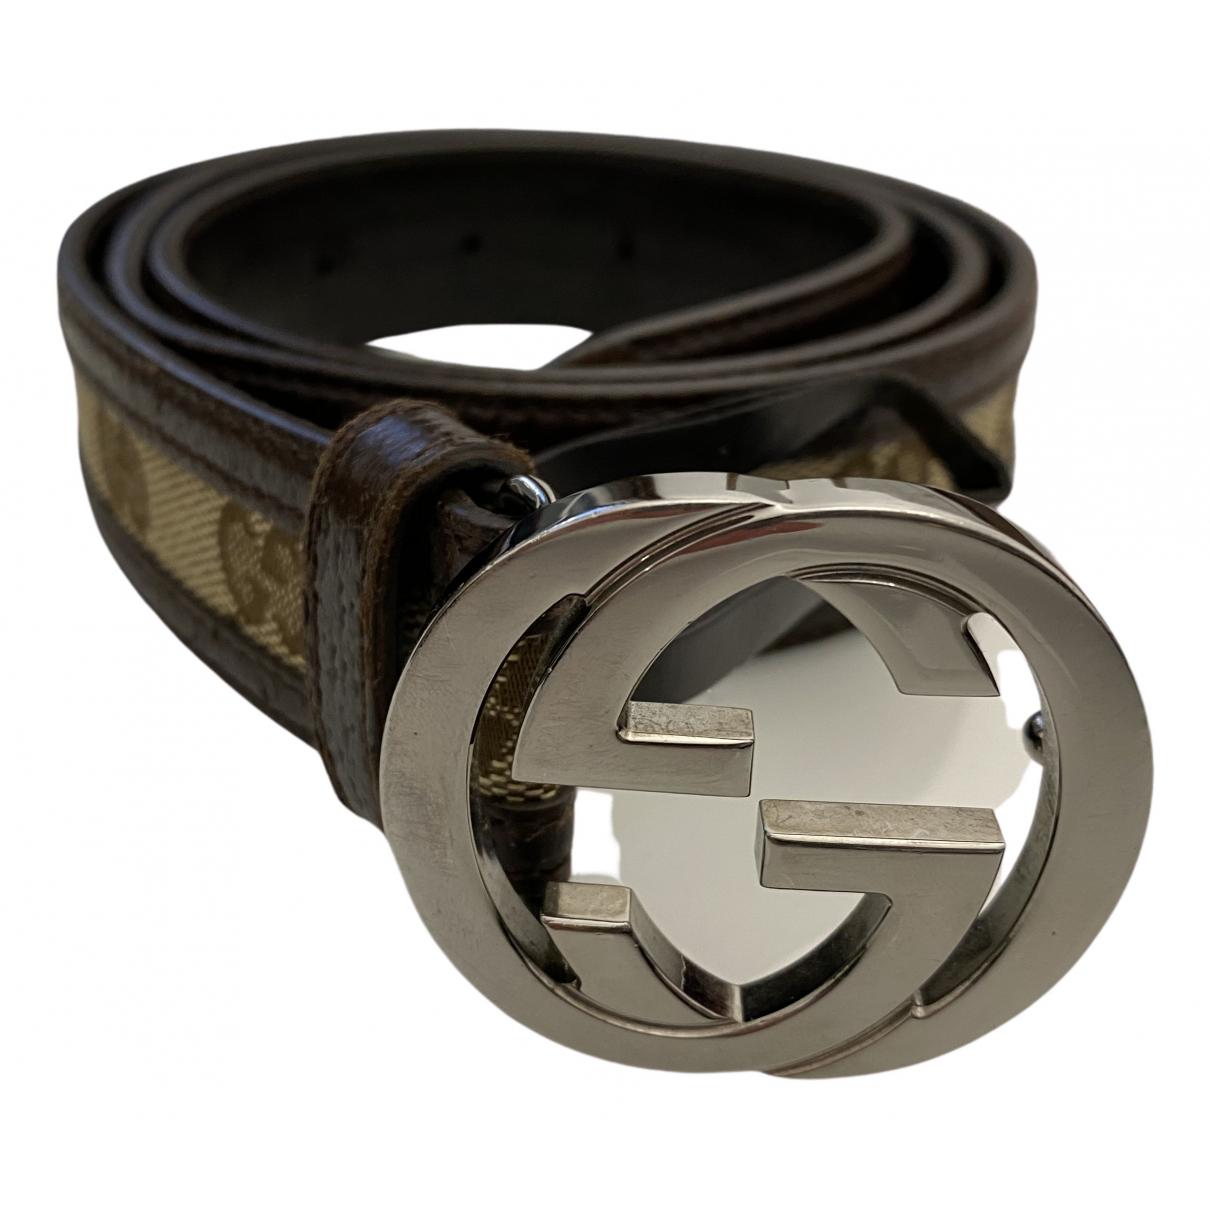 Gucci Interlocking Buckle Brown Cloth belt for Women 85 cm